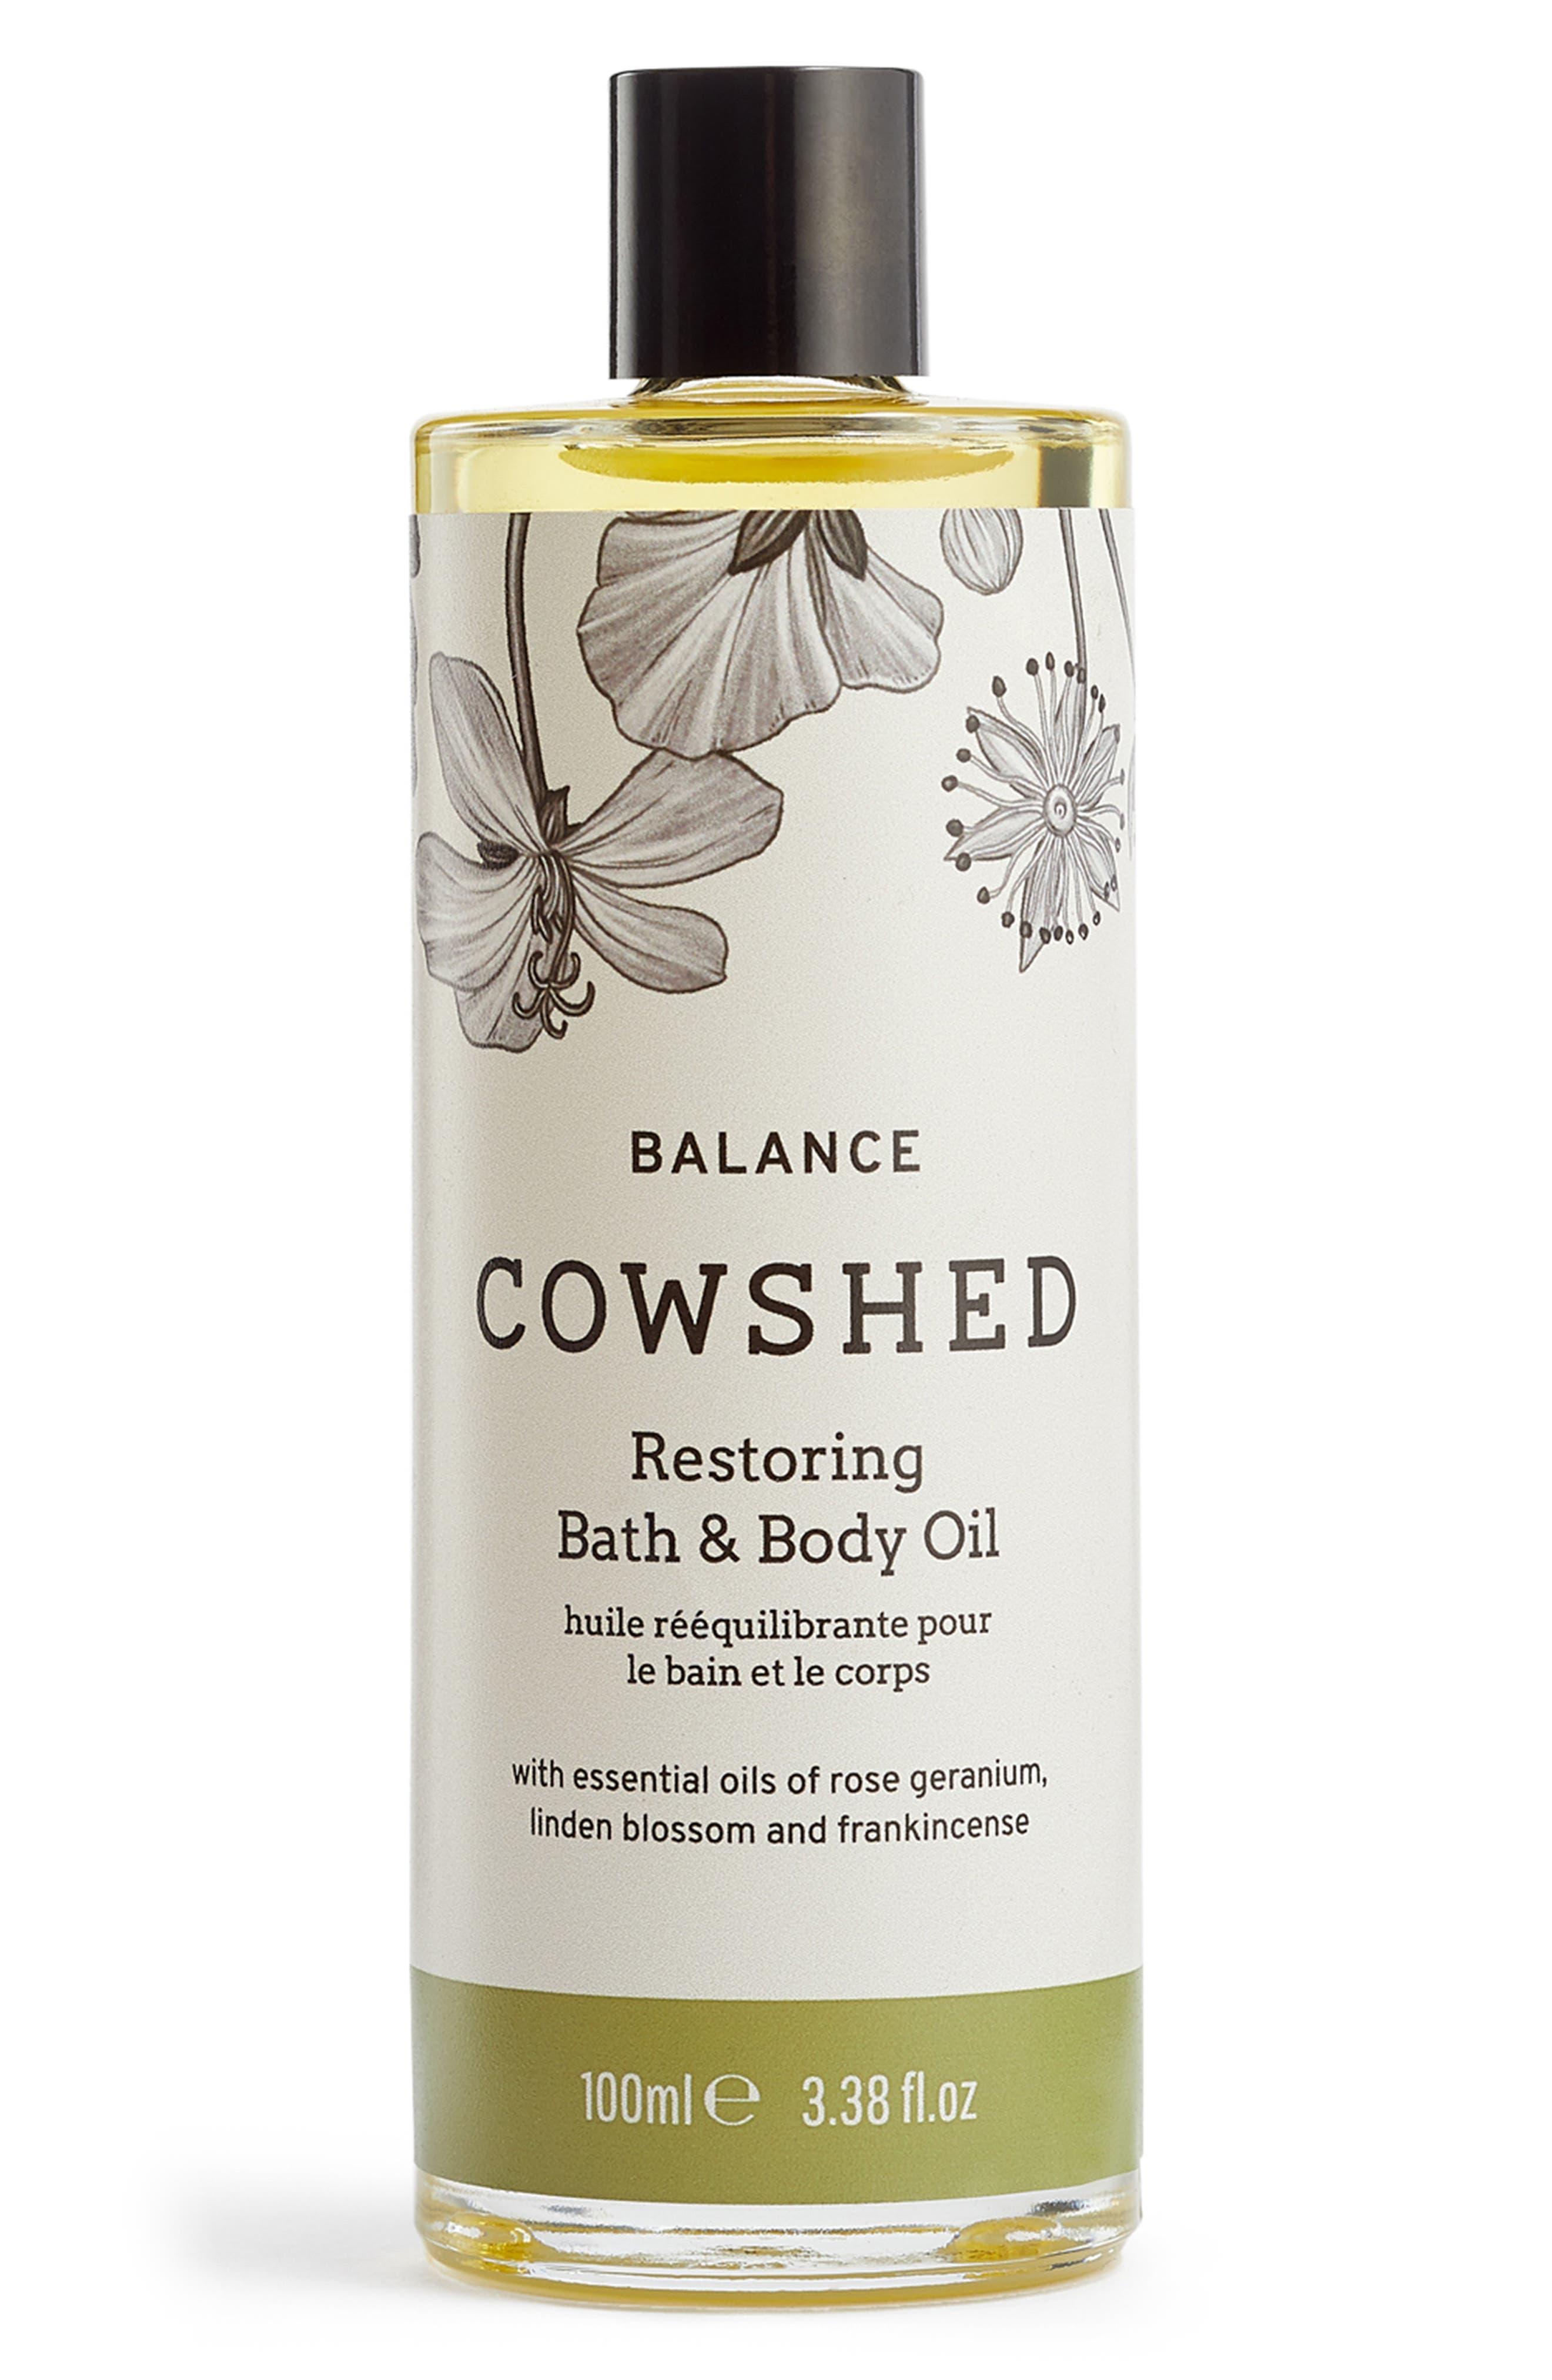 Balance Restoring Bath & Body Oil